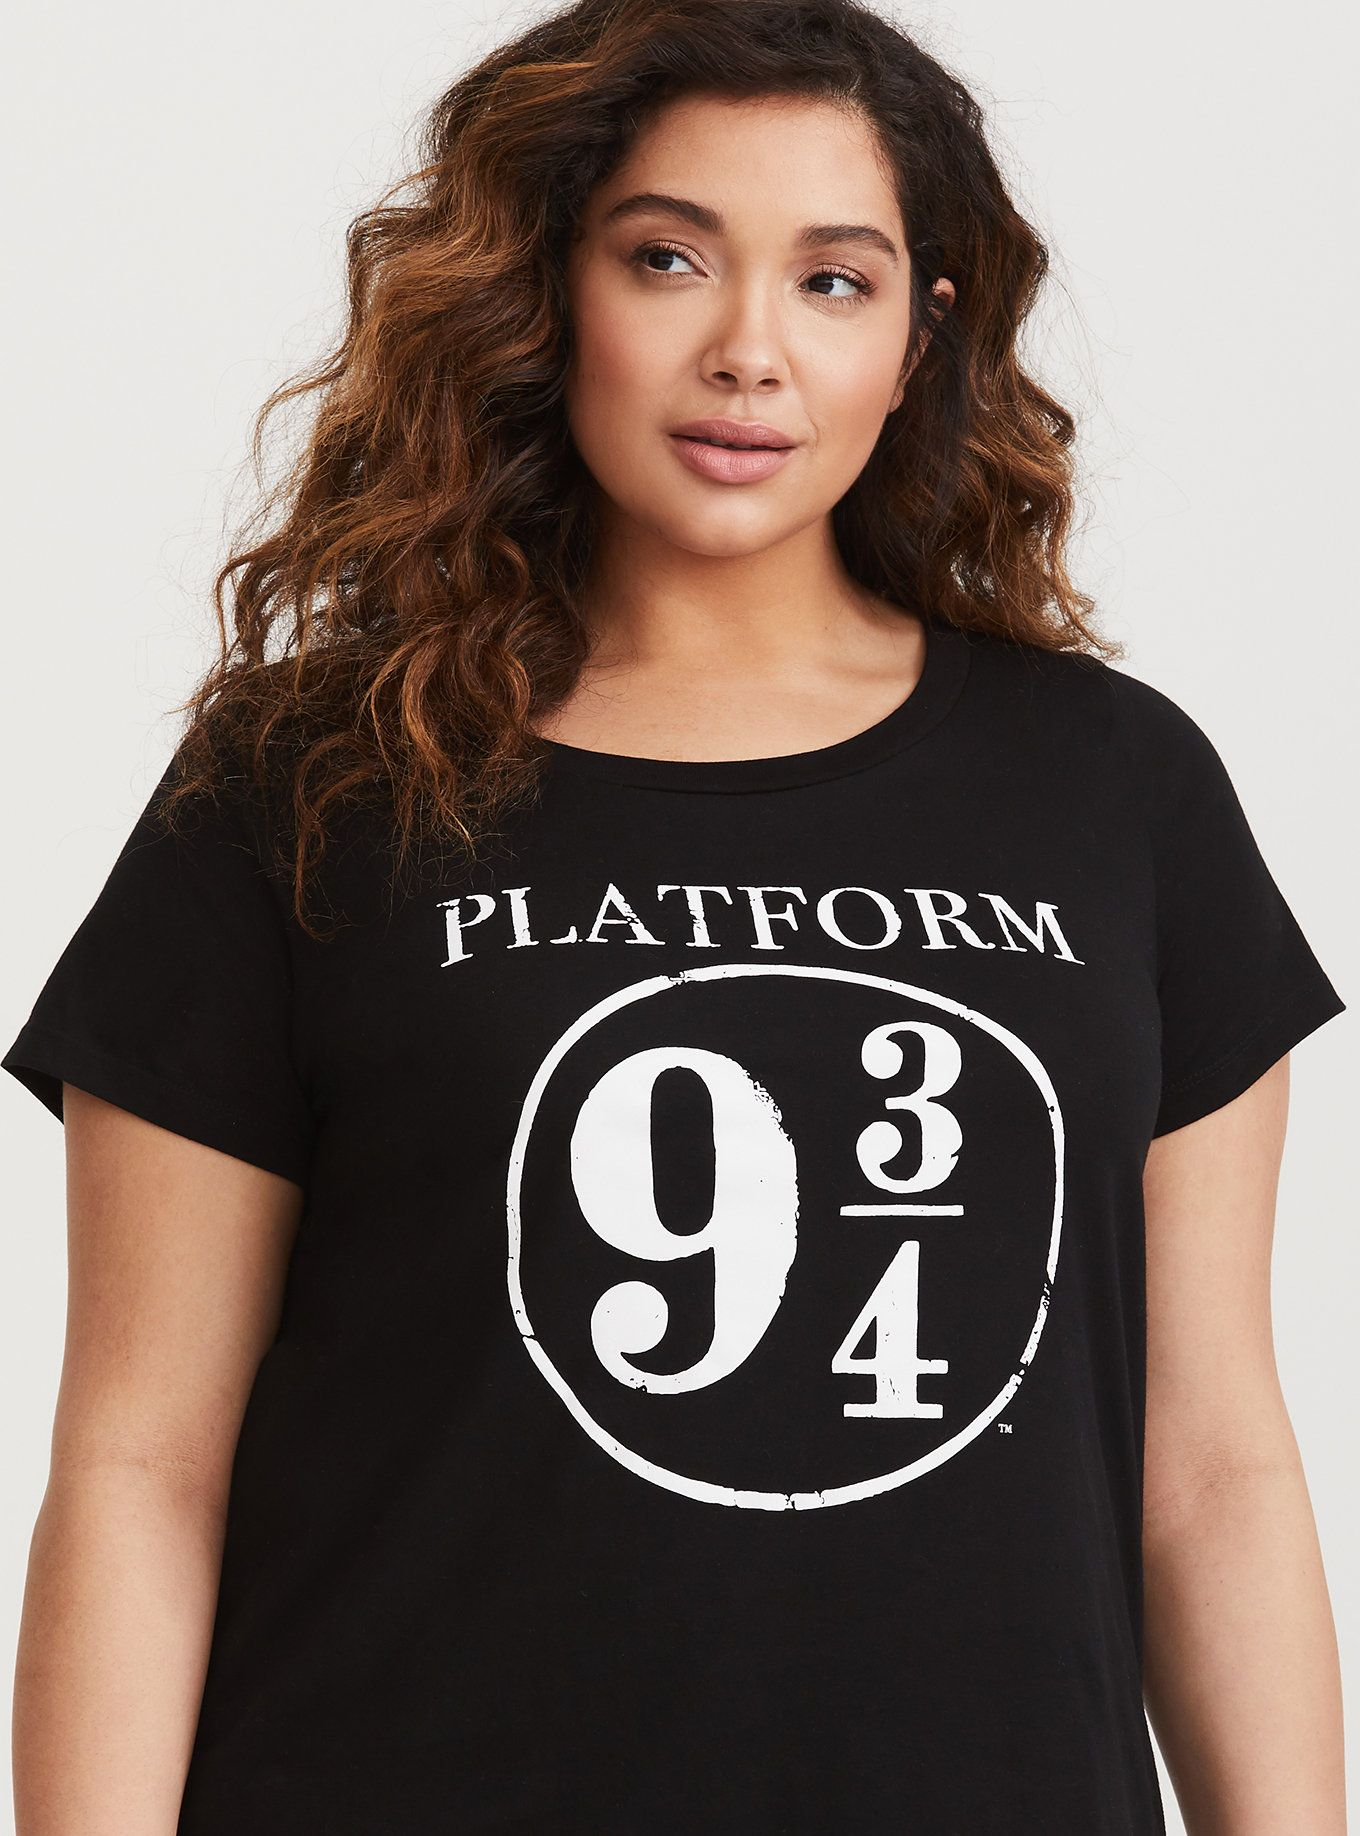 71baba56797 Plus Size Harry Potter Platform 9 3 4 Tshirt